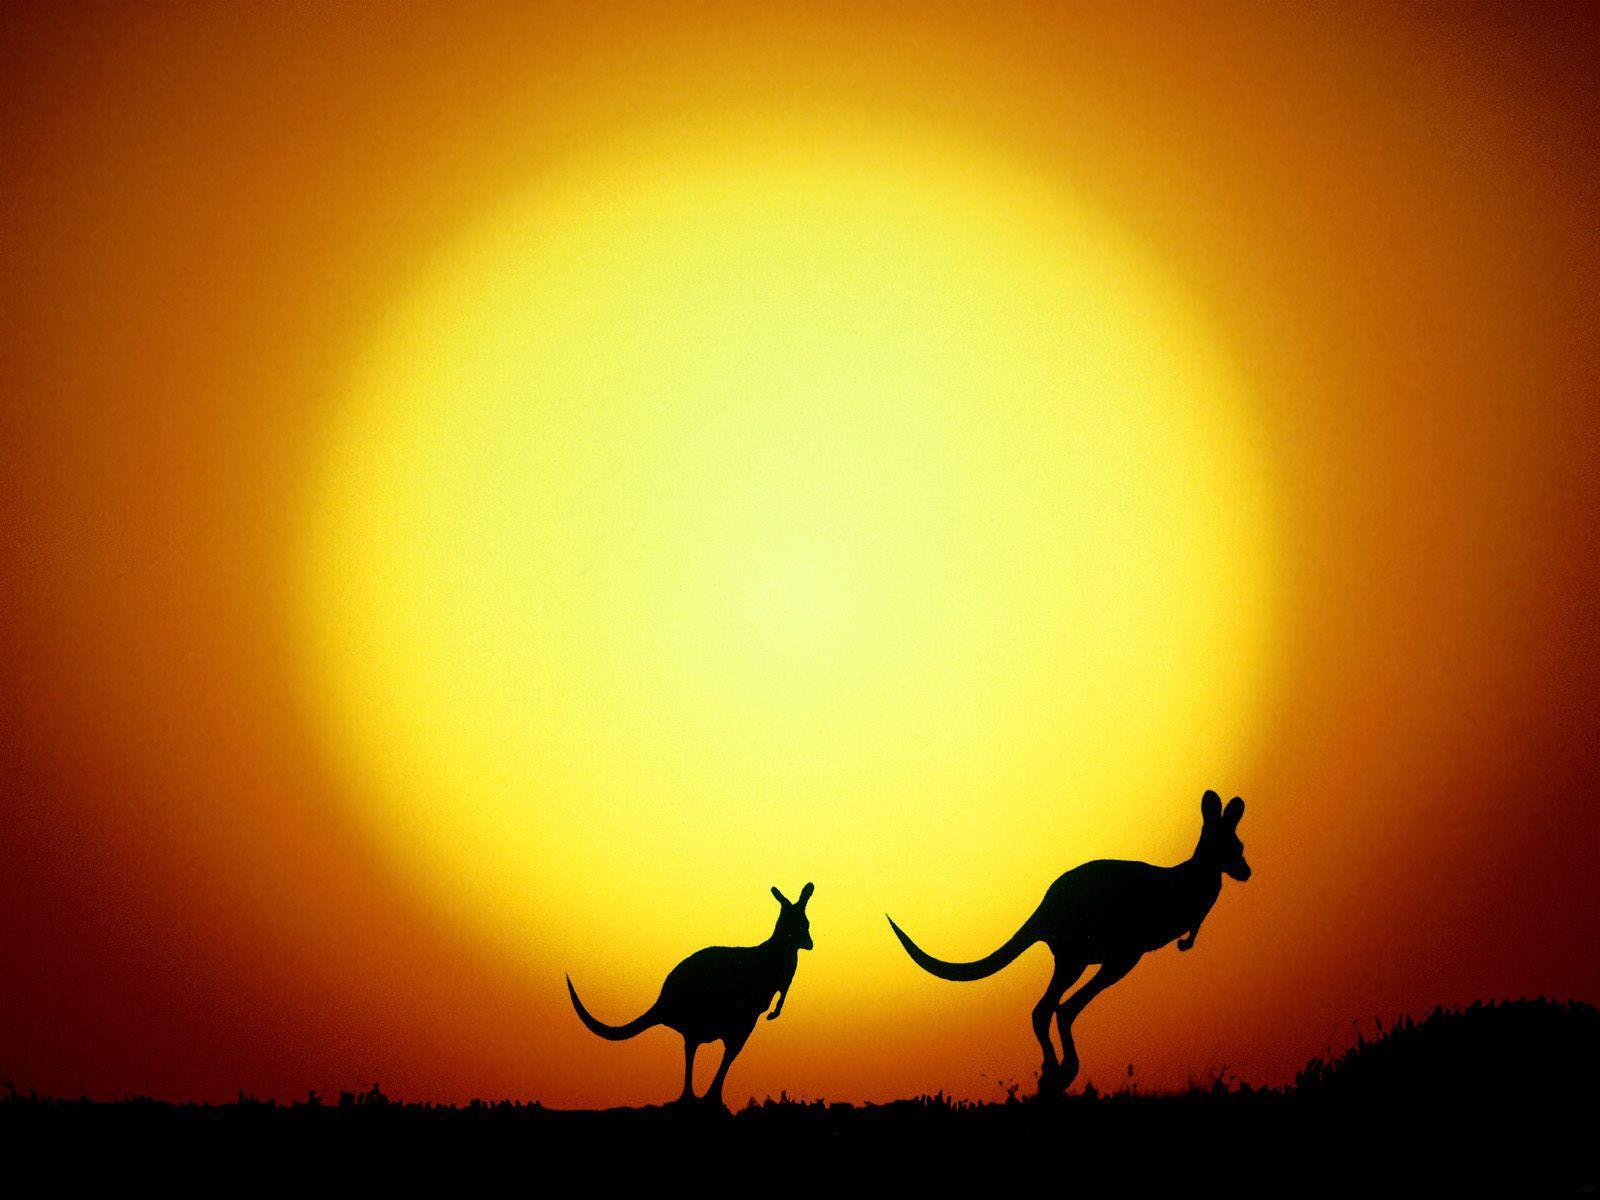 australian background Google Search Australia